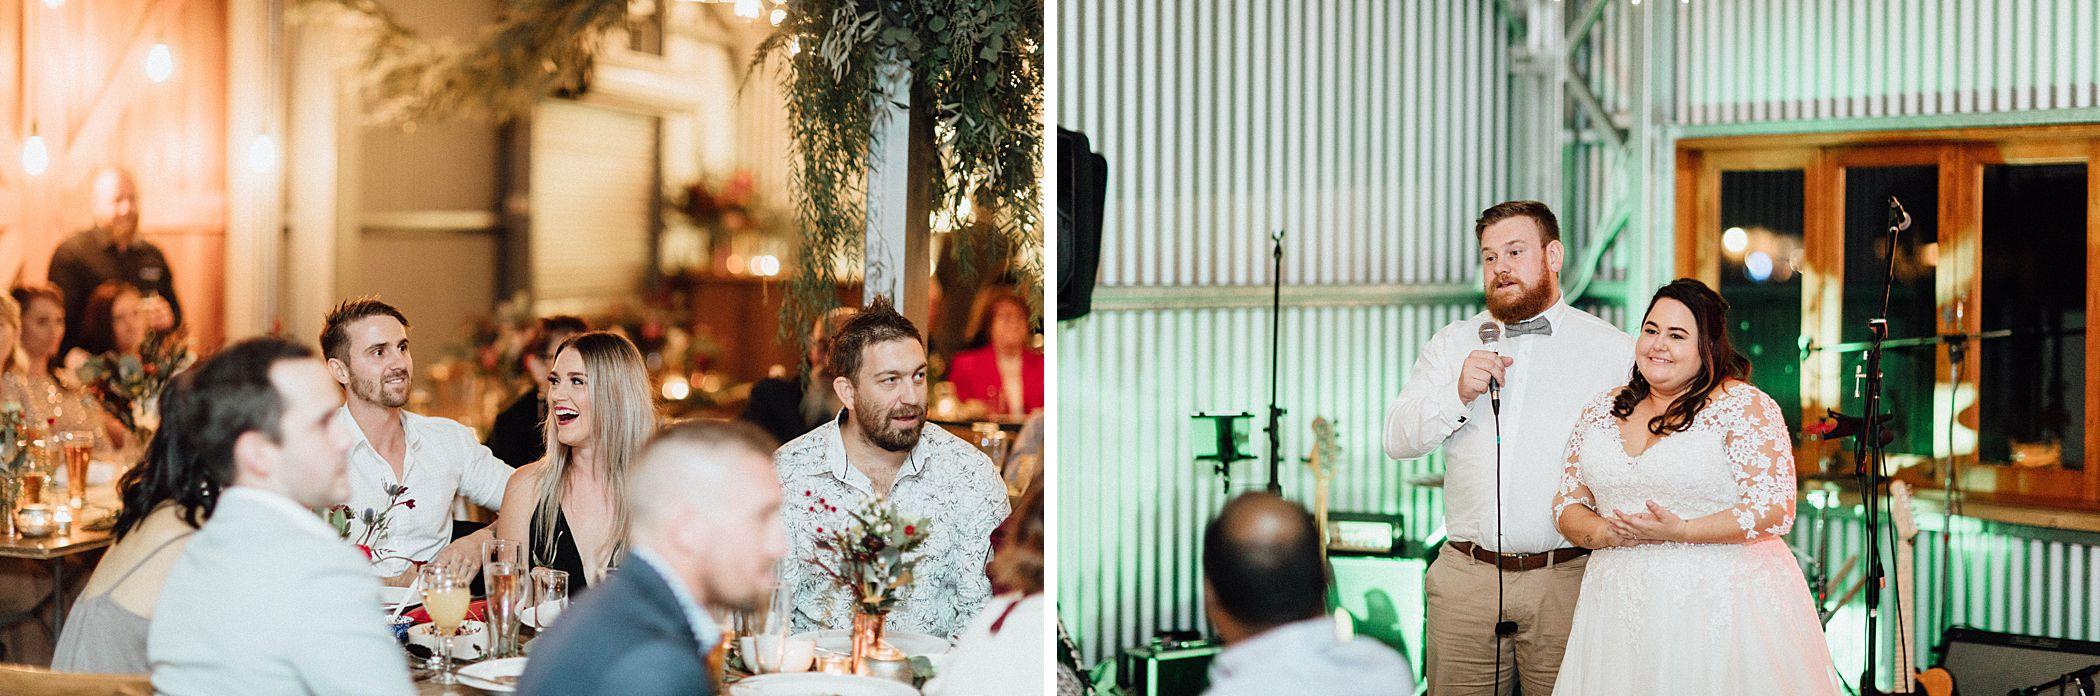 lauren-anne-photography-newcastle-hunter-valley-wedding-photographer_1267.jpg